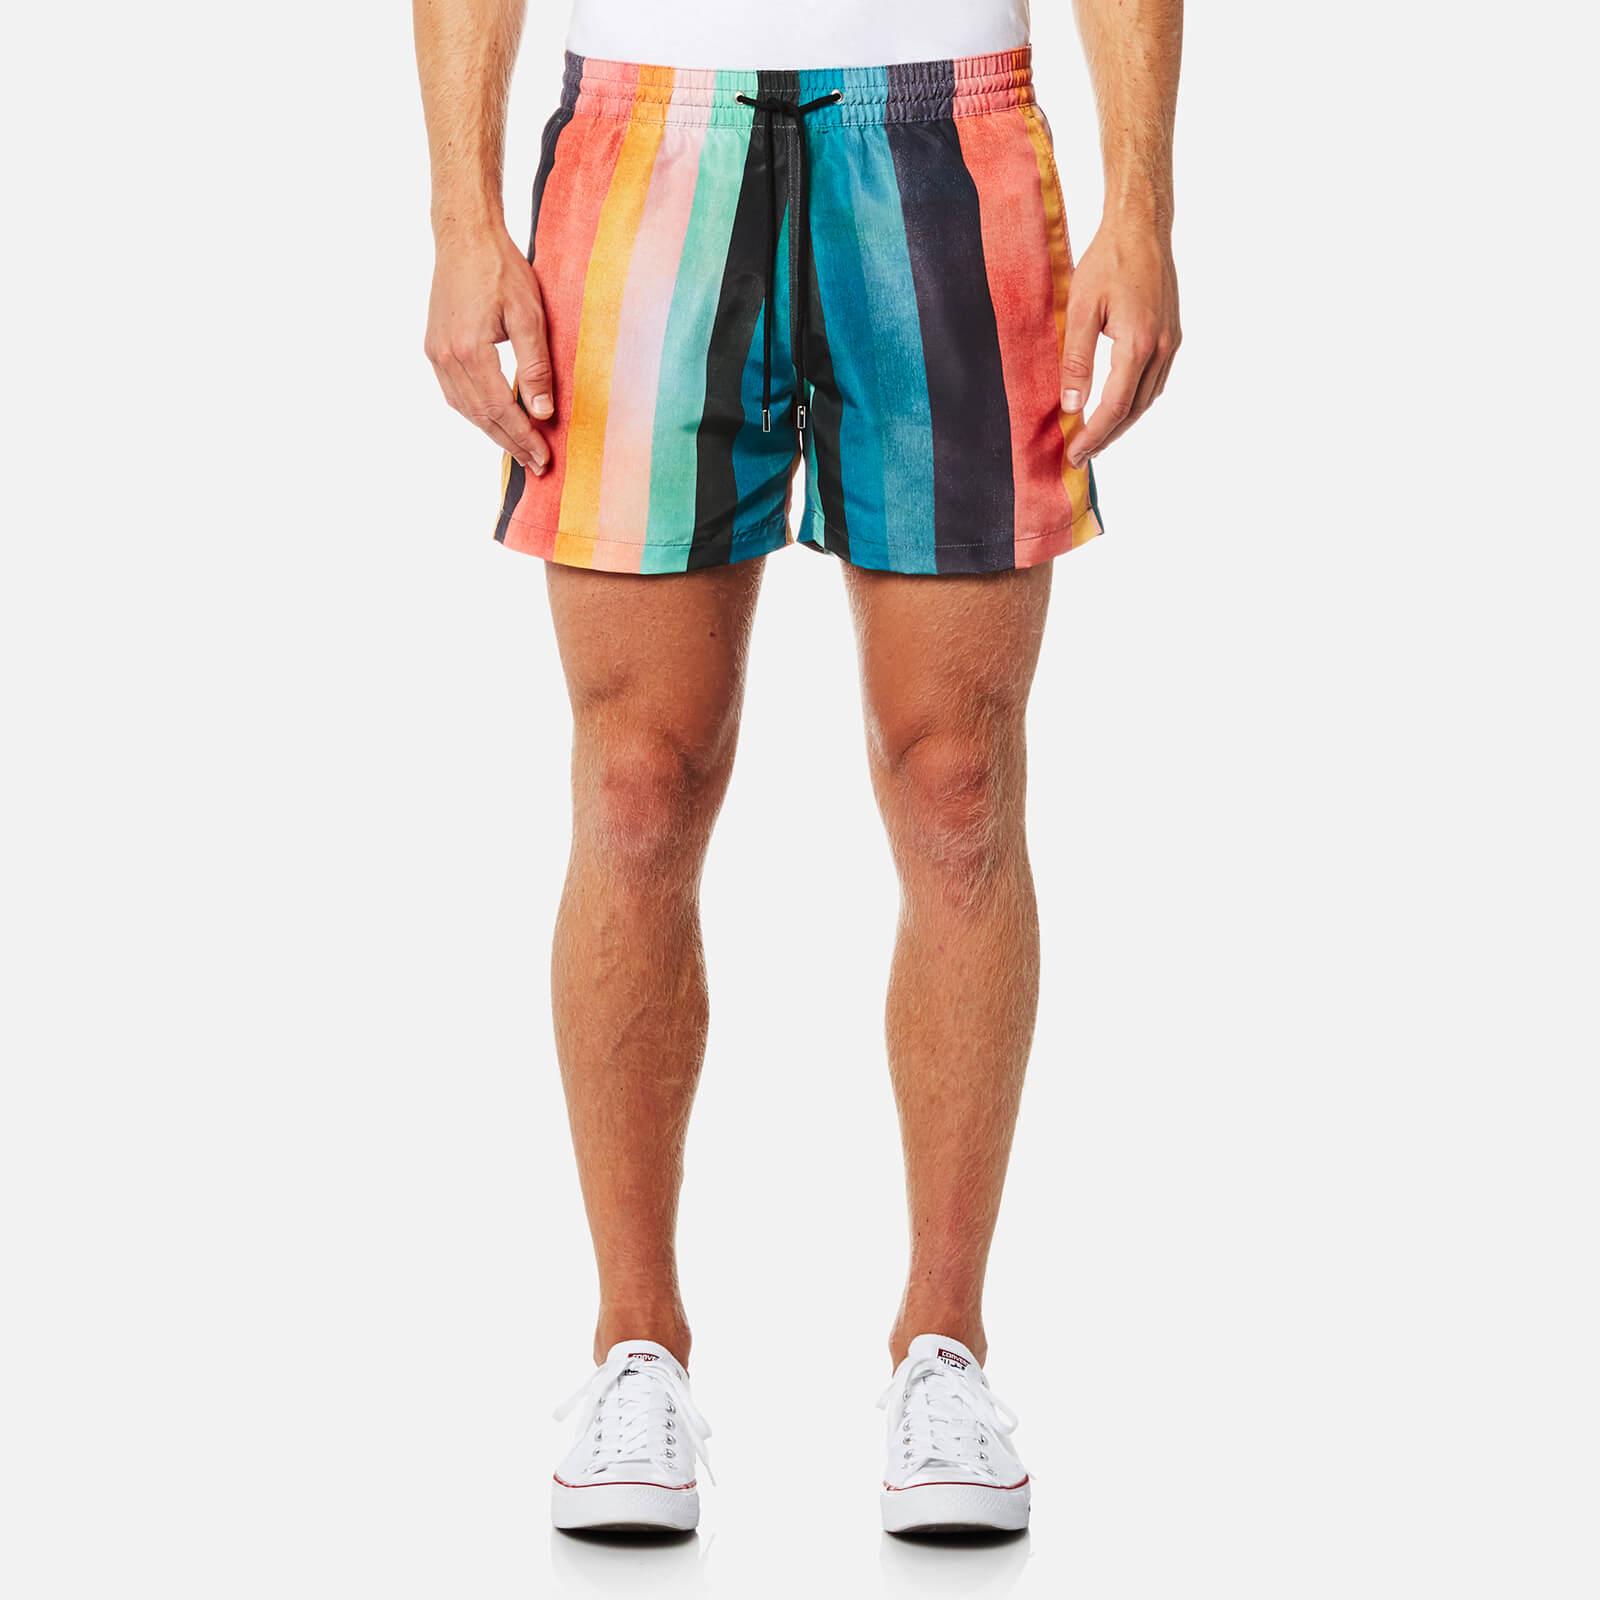 a6b6b7b865 Paul Smith Men's Classic Artist Stripe Swim Shorts - Multi - Free UK  Delivery over £50